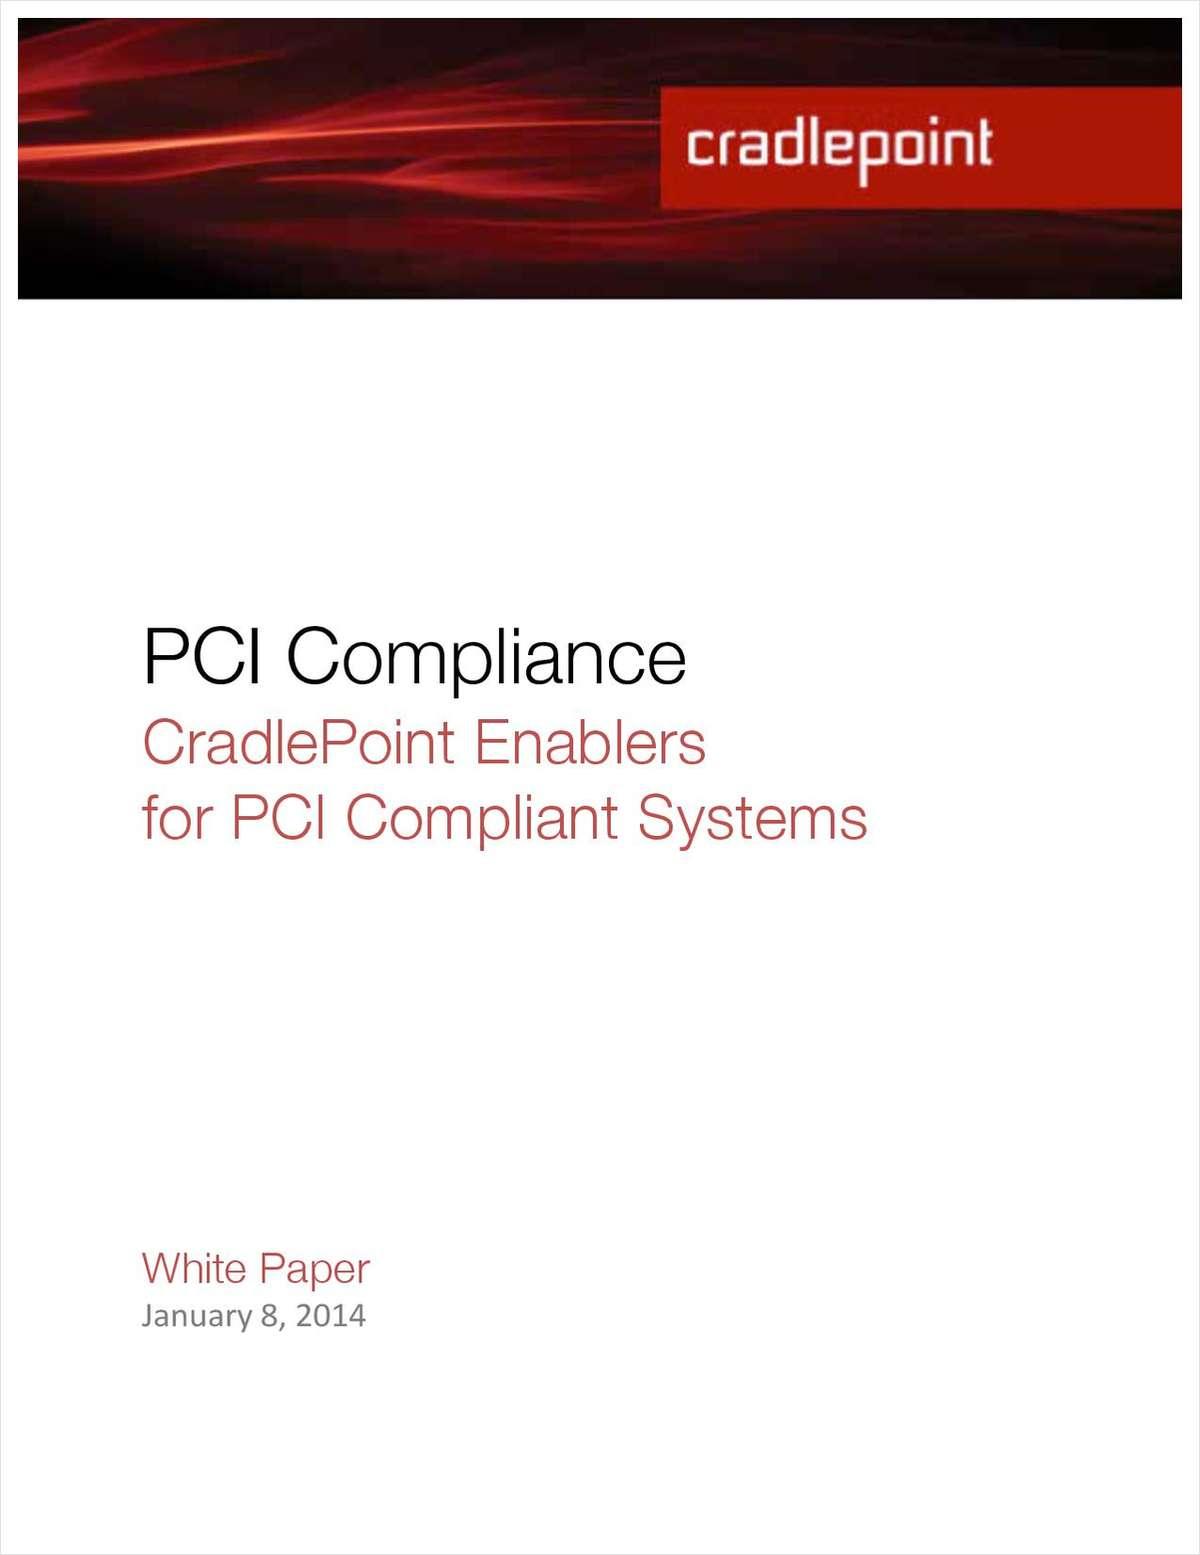 PCI 3.0 Compliance Guide